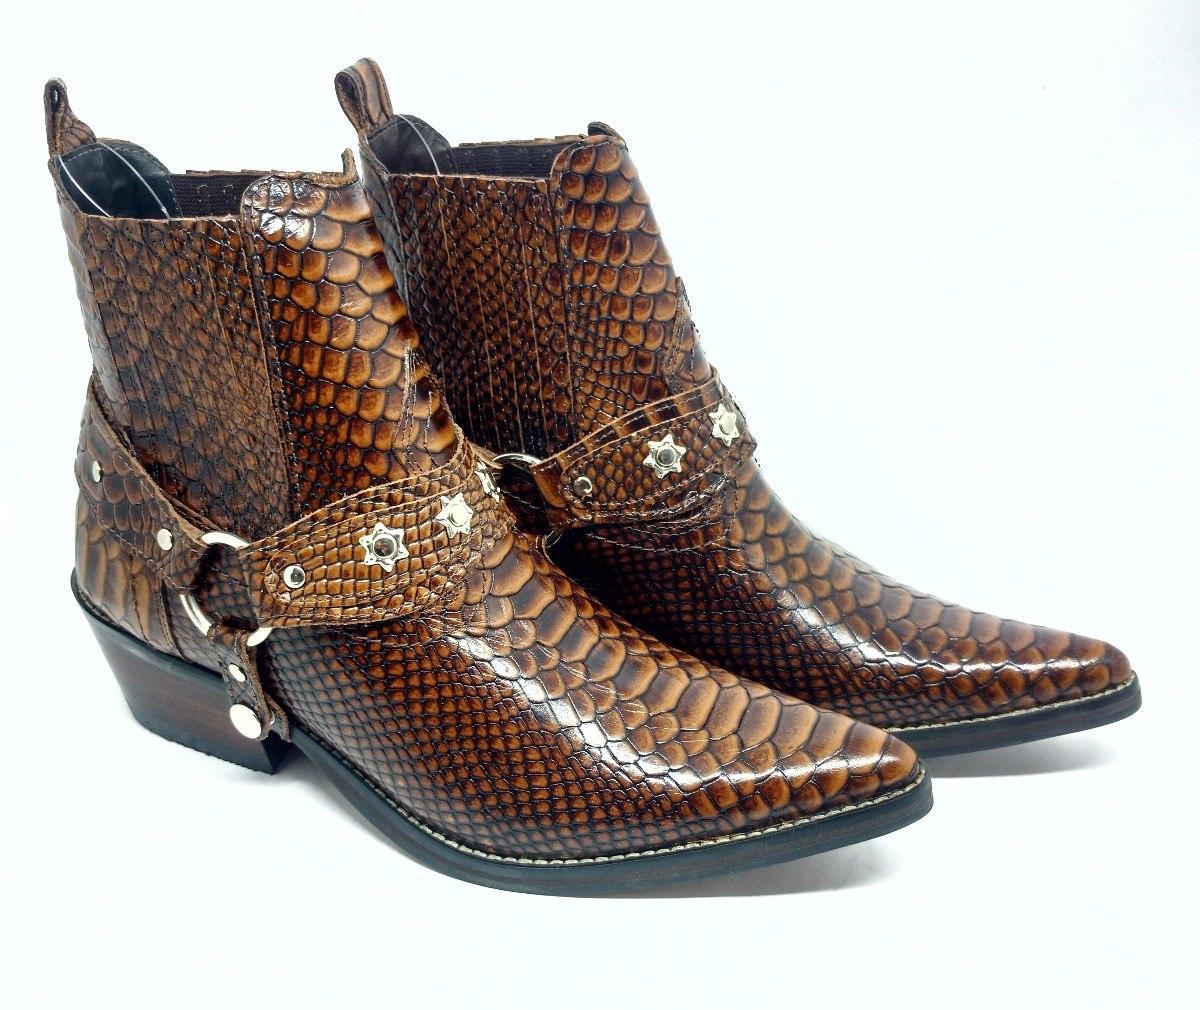 72febdd7066 bota botina country bico fino masculina couro anaconda luxo. Carregando  zoom.